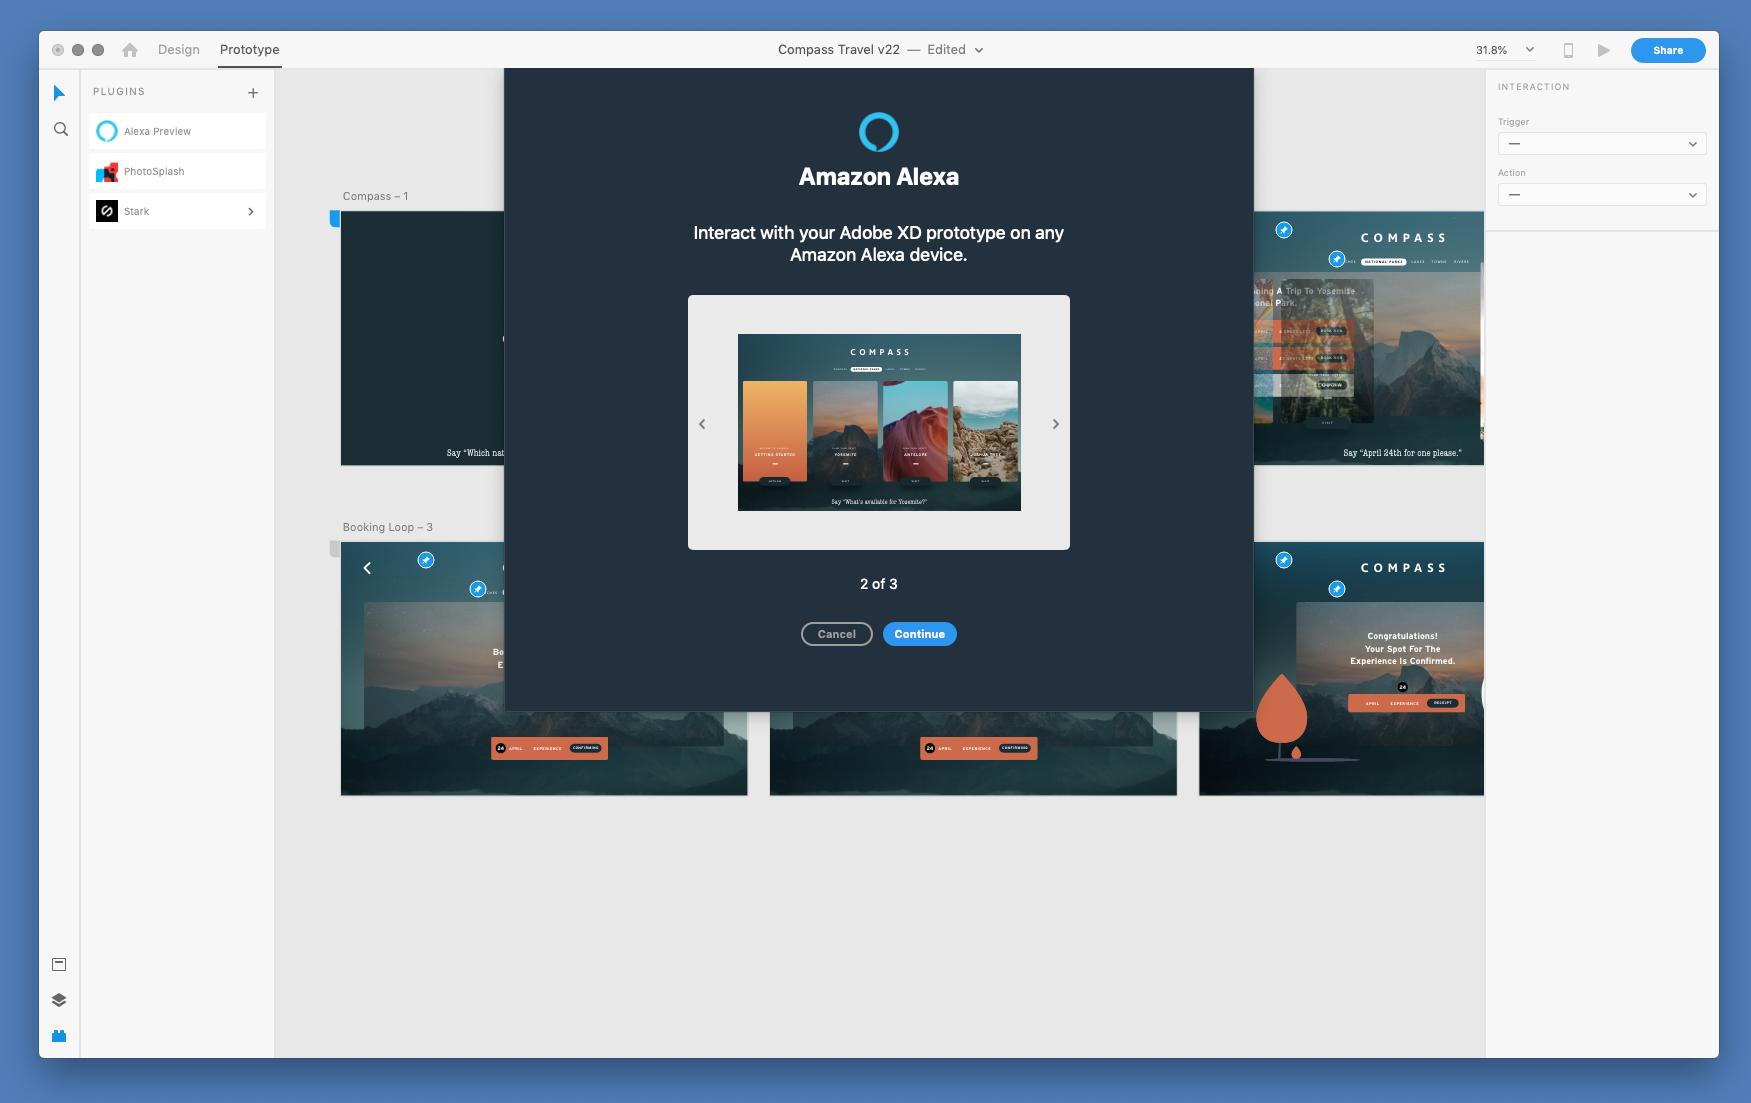 XD Amazon Alexa Plugin 01 - Adobe brings Alexa integration to its XD prototyping tool